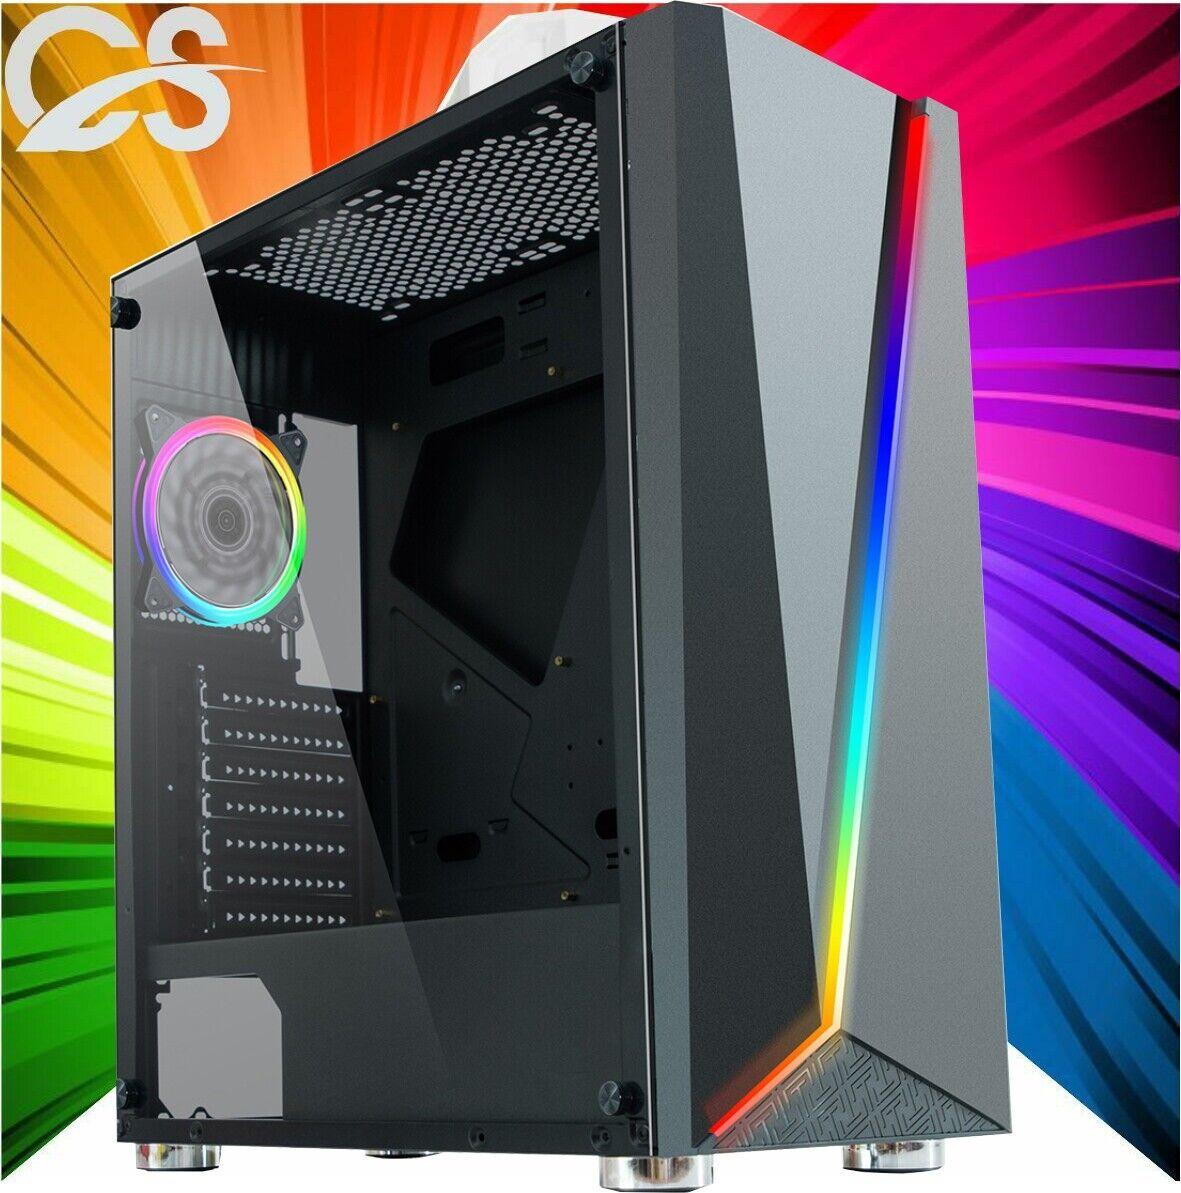 Computer Games - ULTRA FAST Gaming PC Computer Intel Quad Core i5 8GB 120GB Win10 2GB GT710 CHEAP